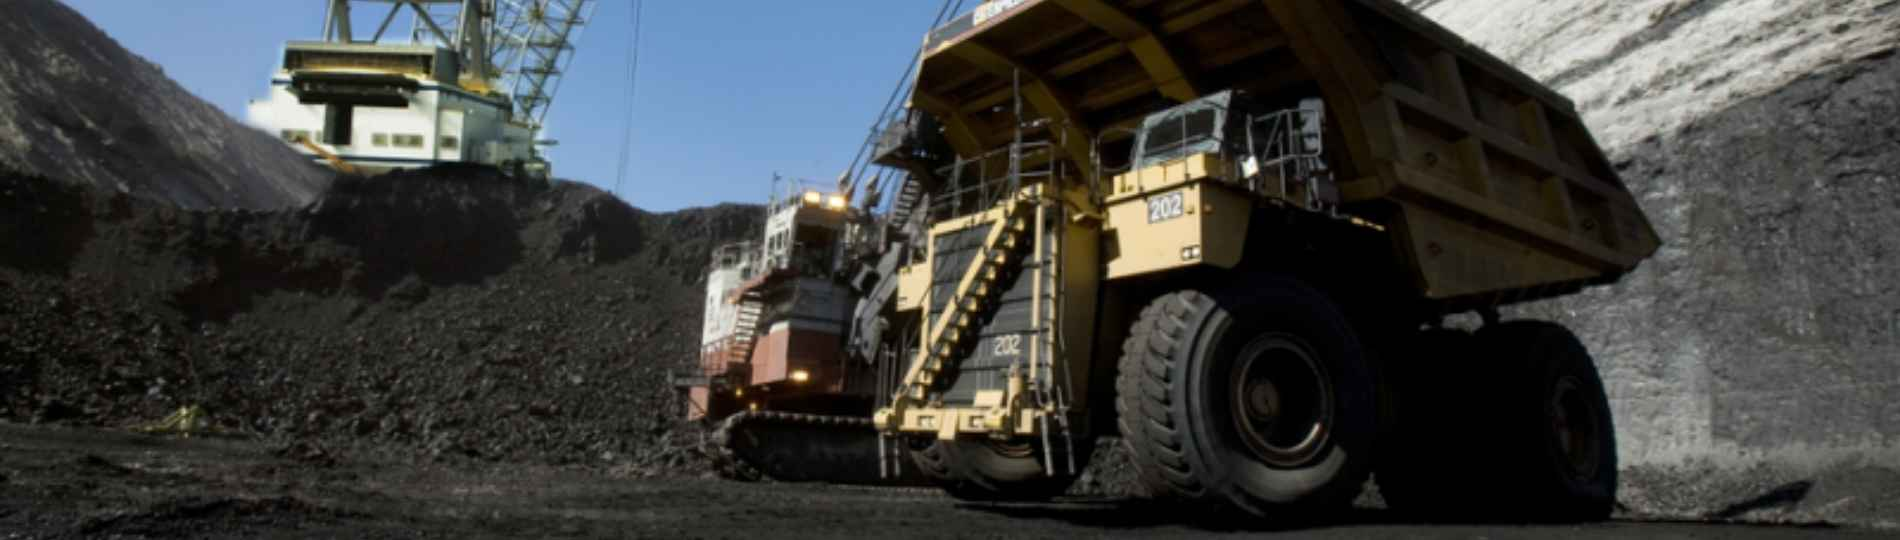 Coal desert